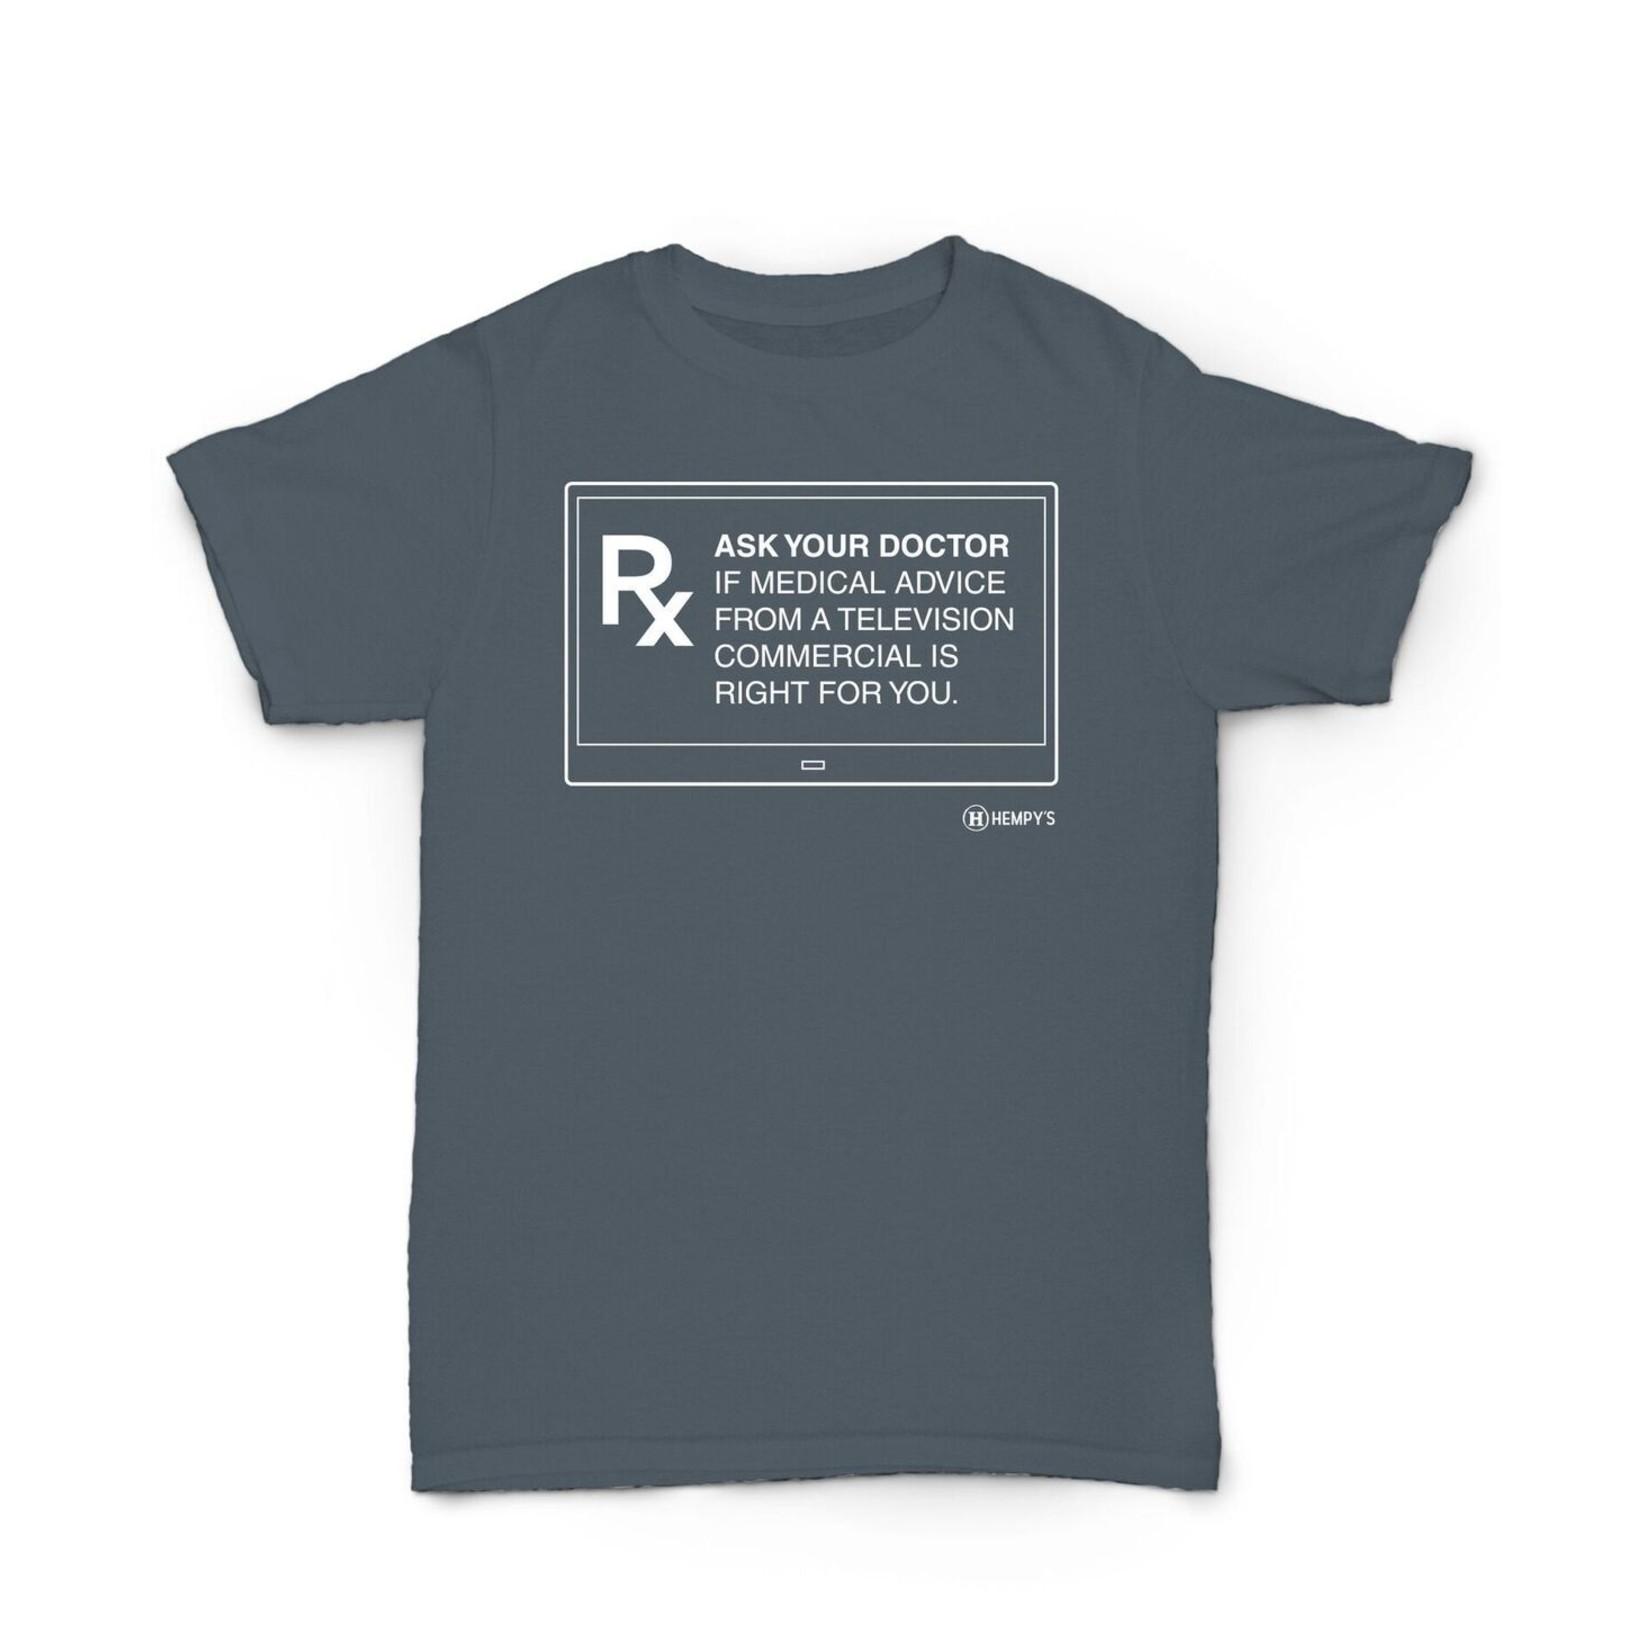 Hempy's Hemp T Shirt Ask Your Doctor